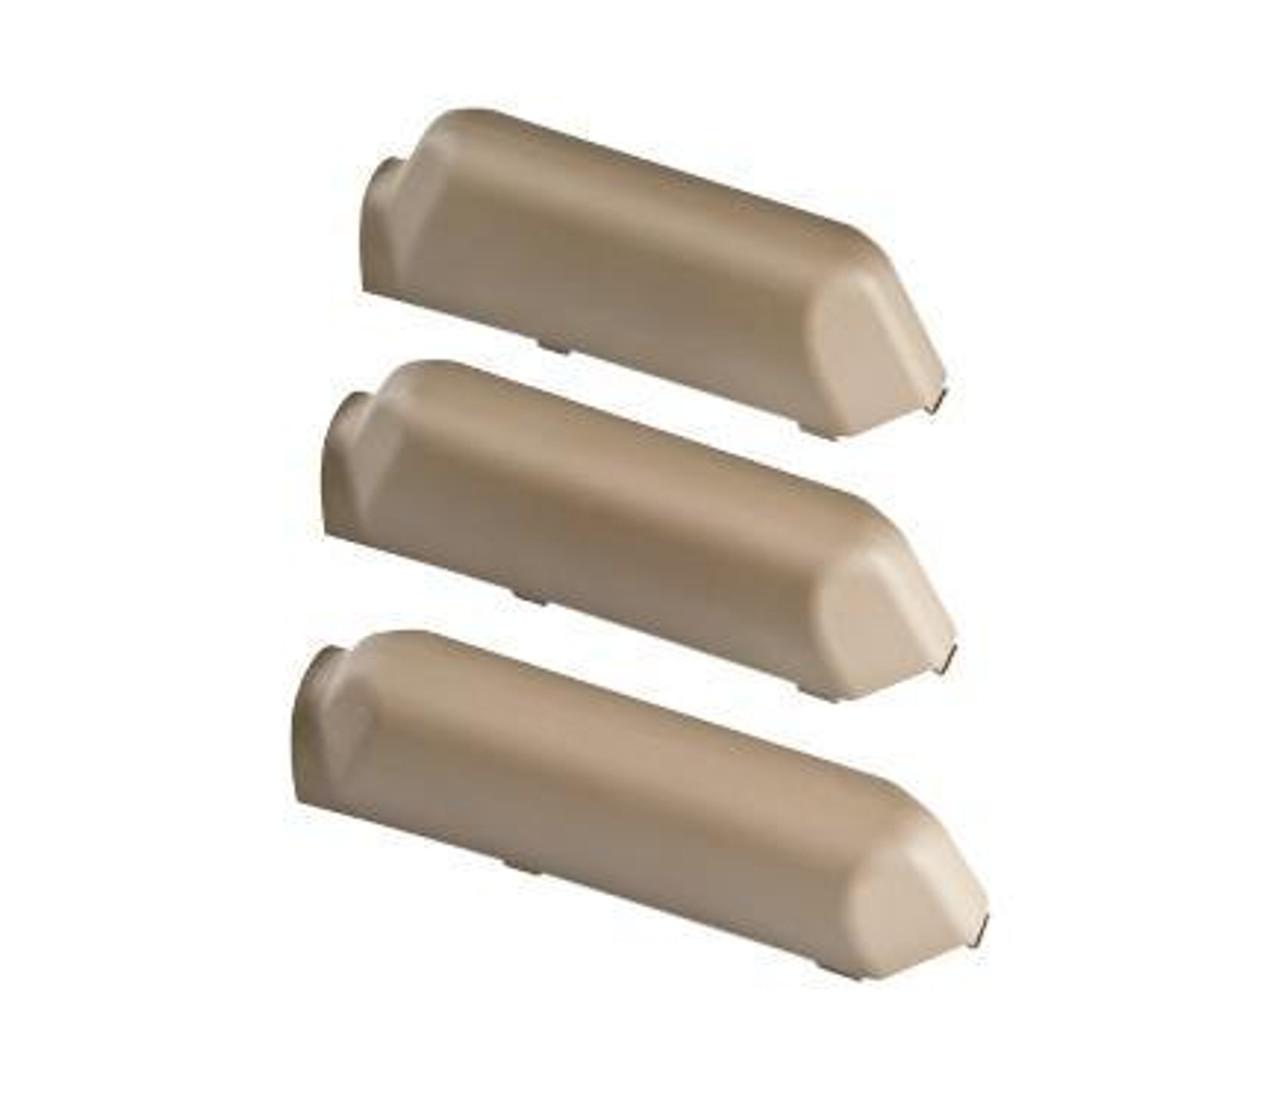 Magpul Hunter/SGA High Cheek Riser Kit